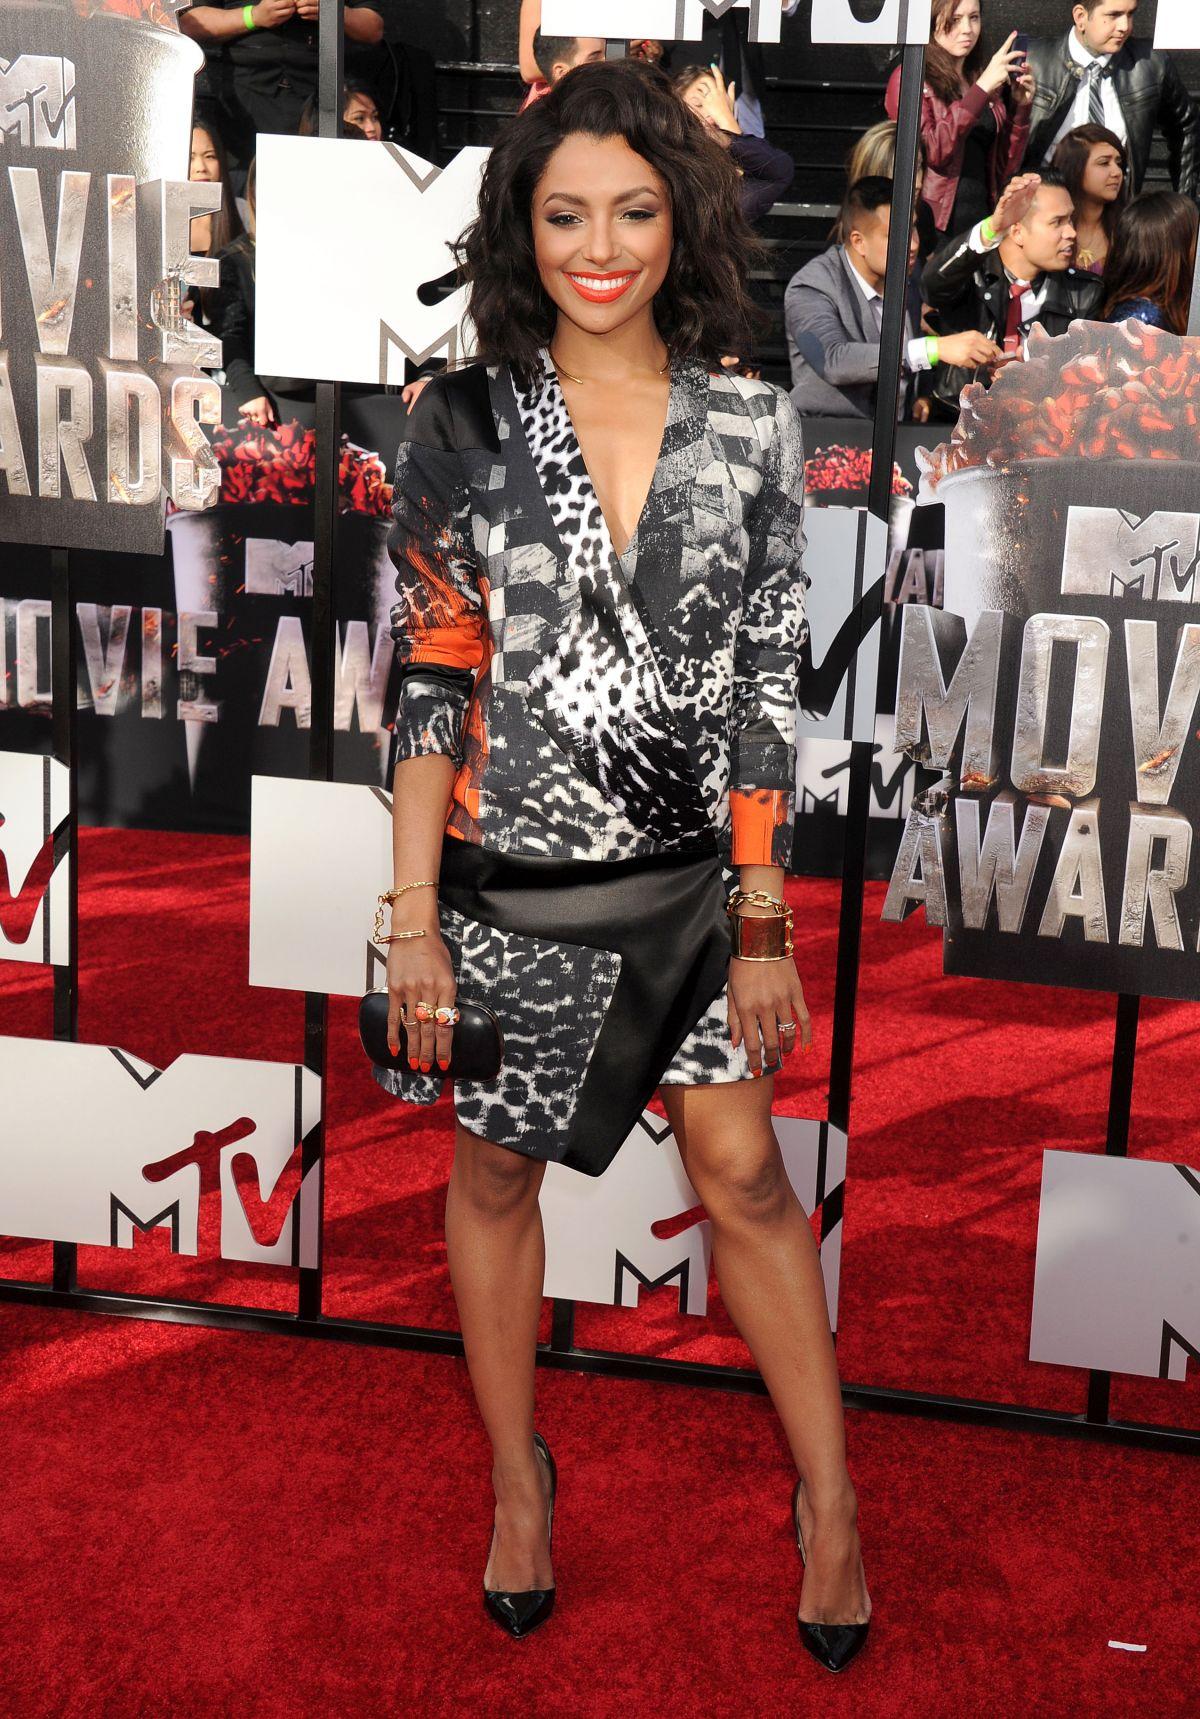 KAT GRAHAM at MTV Movi...